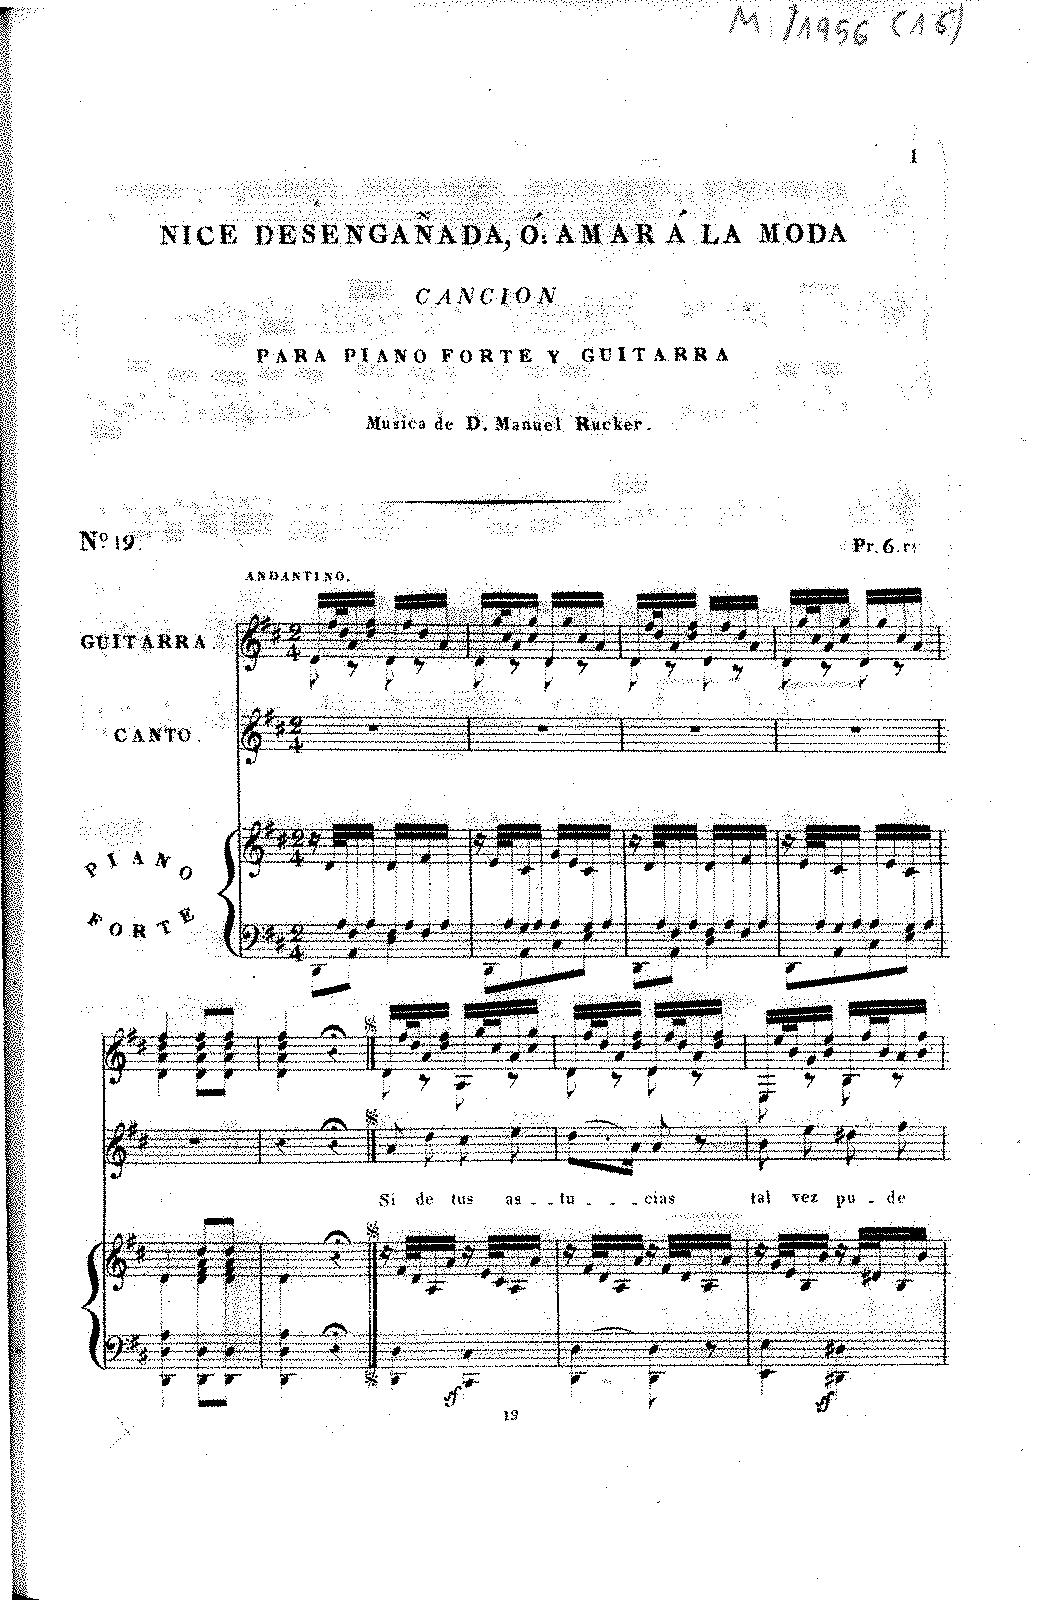 Nice desengañada (Rücker, Manuel) - IMSLP/Petrucci Music